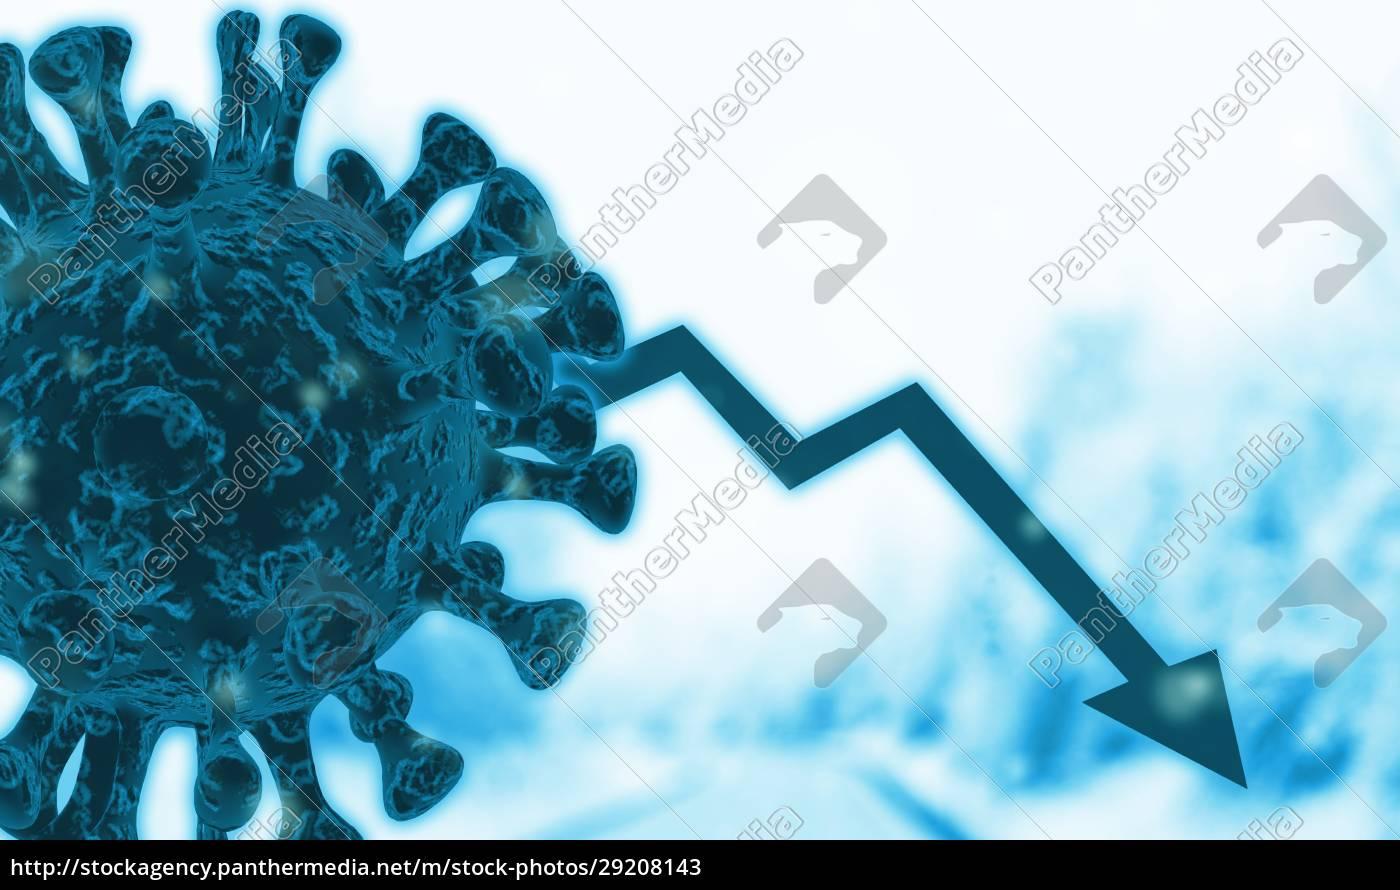 3d, erstellt, corona-virus-konzept., ende, der, corona-pandemie - 29208143